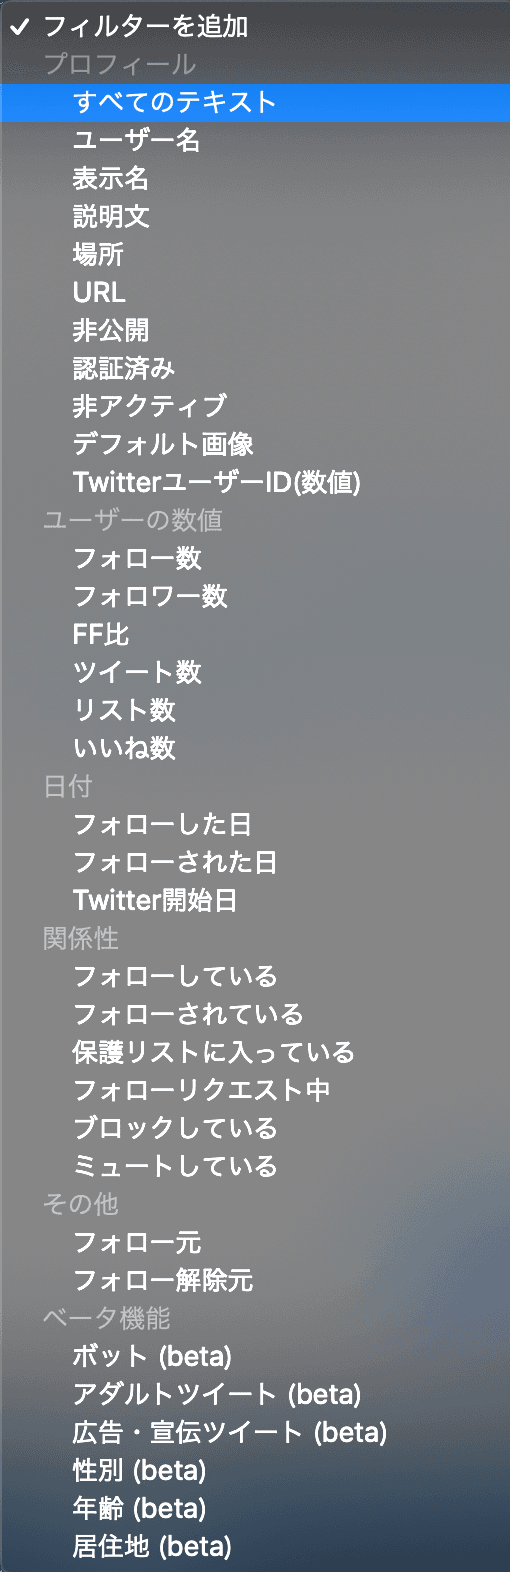 Twitter予約投稿ツール